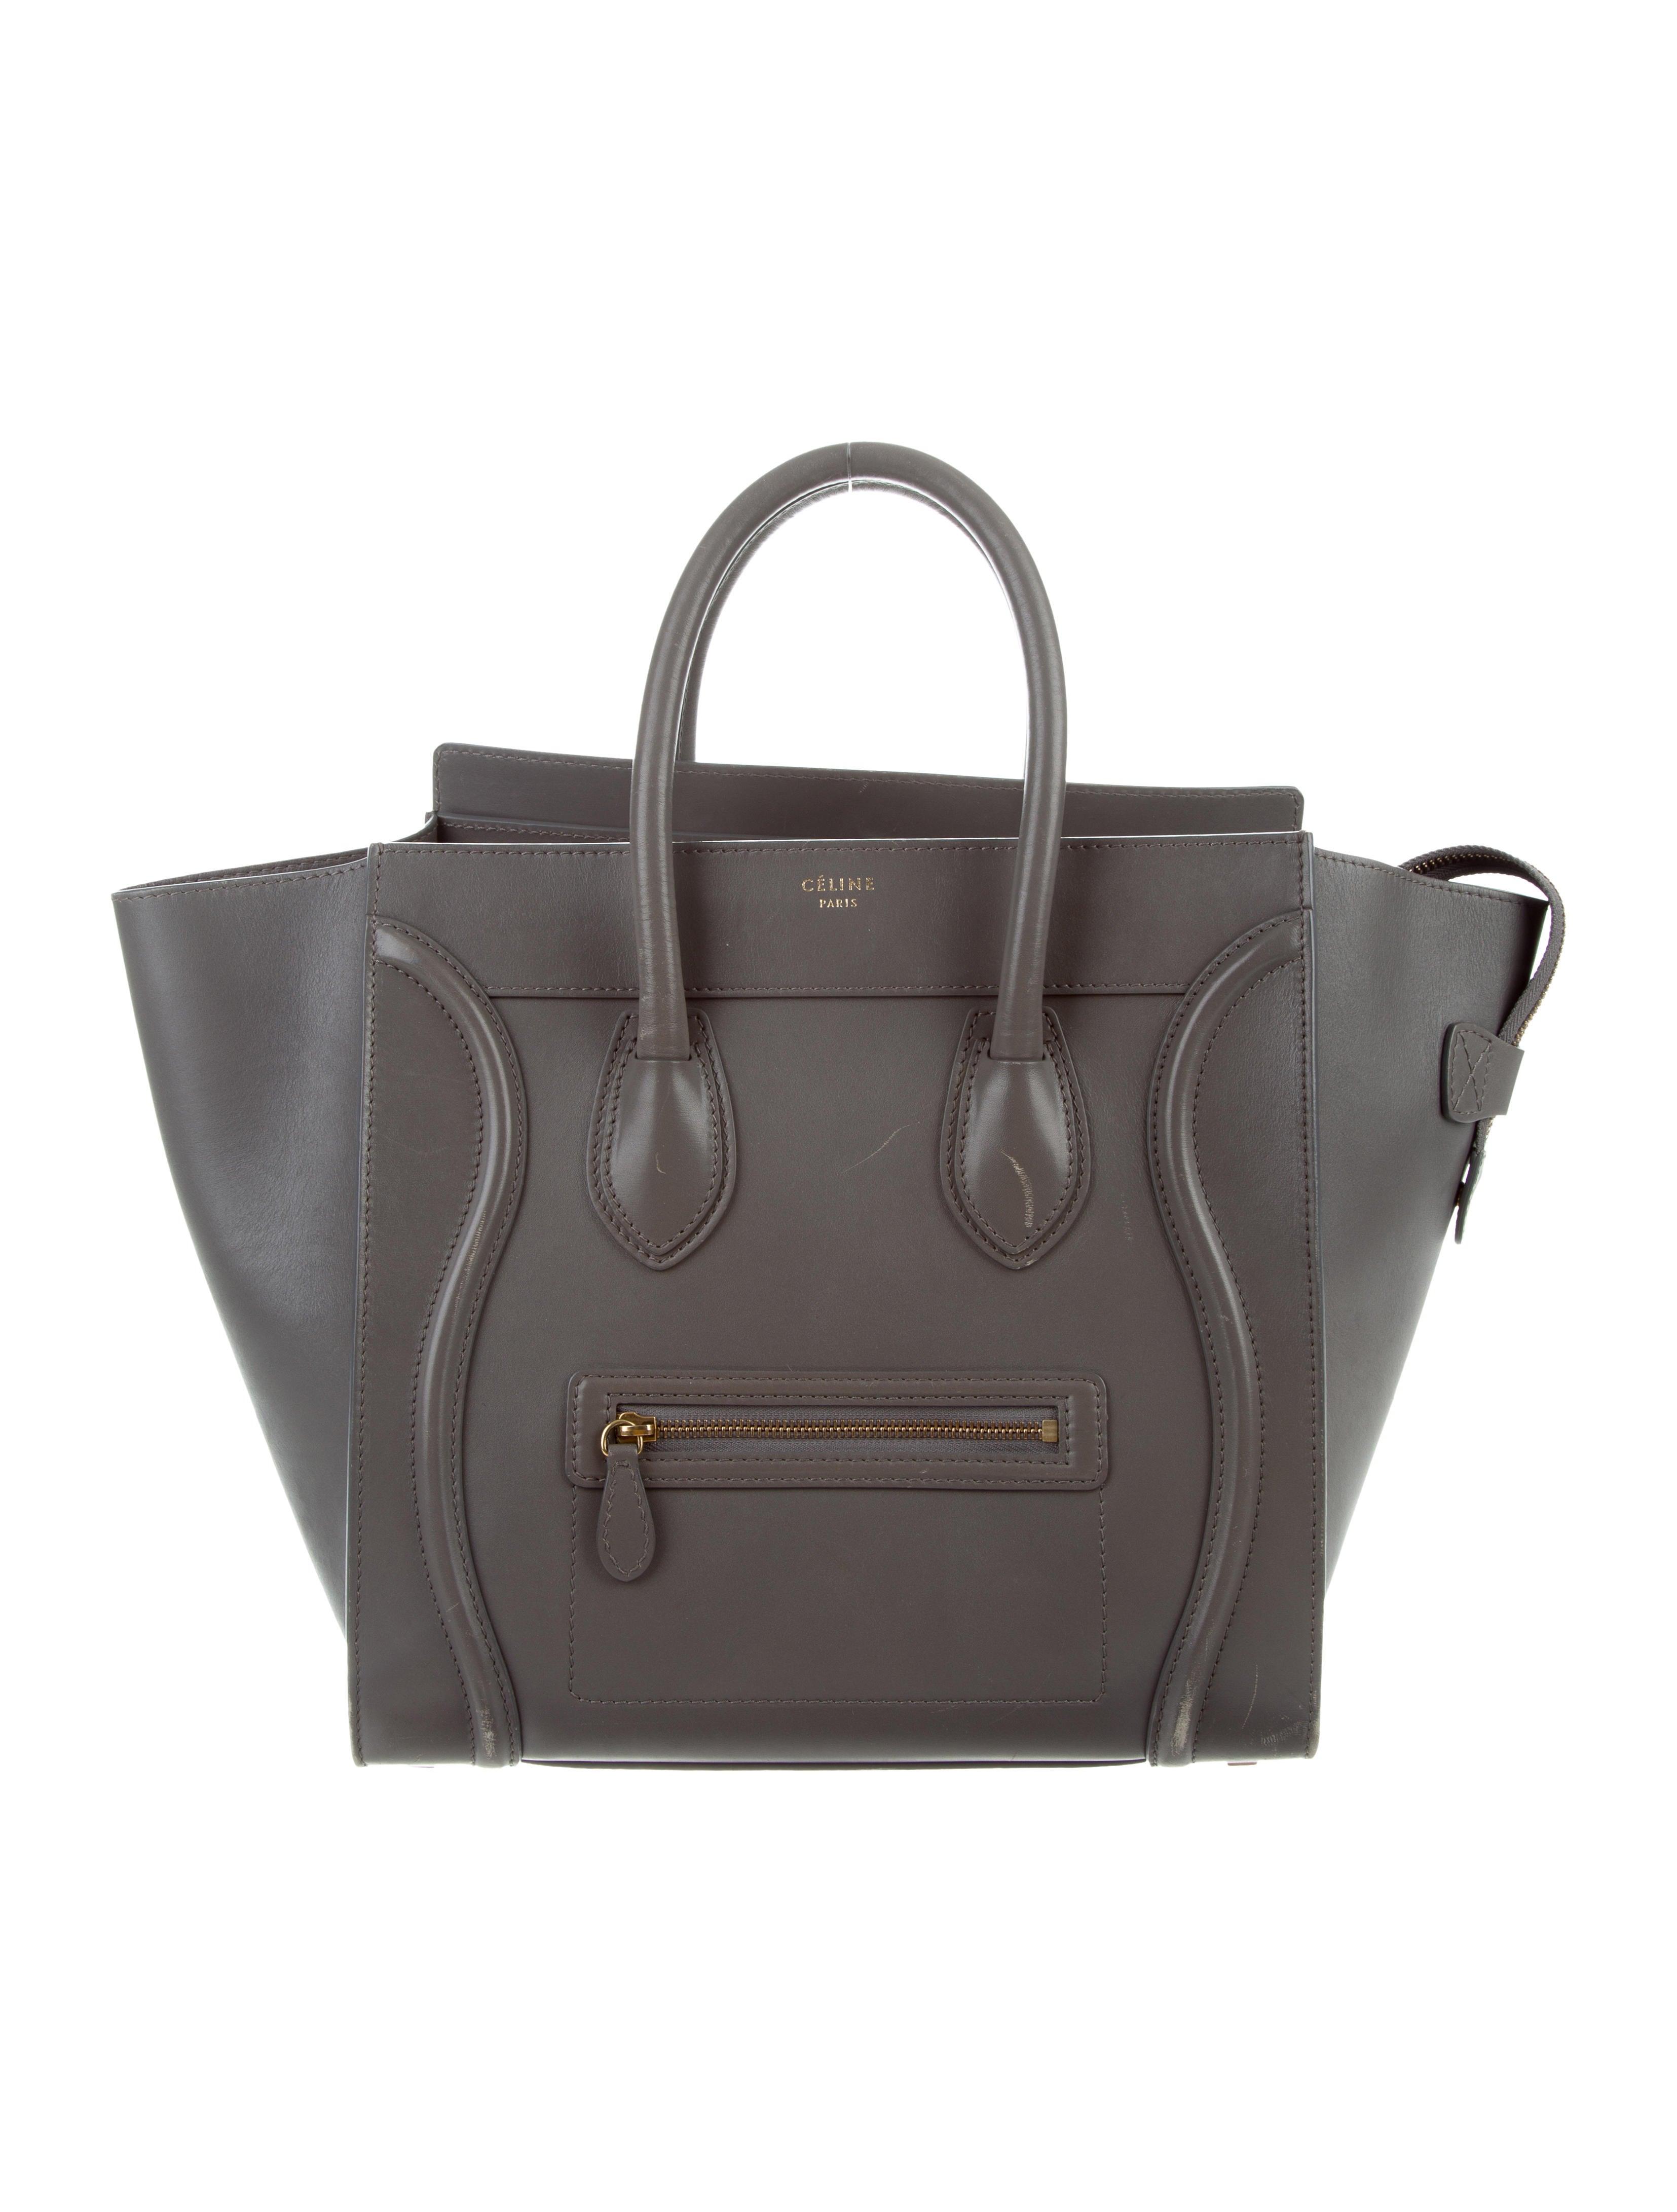 2c7de85f9a75 Celine Handbags